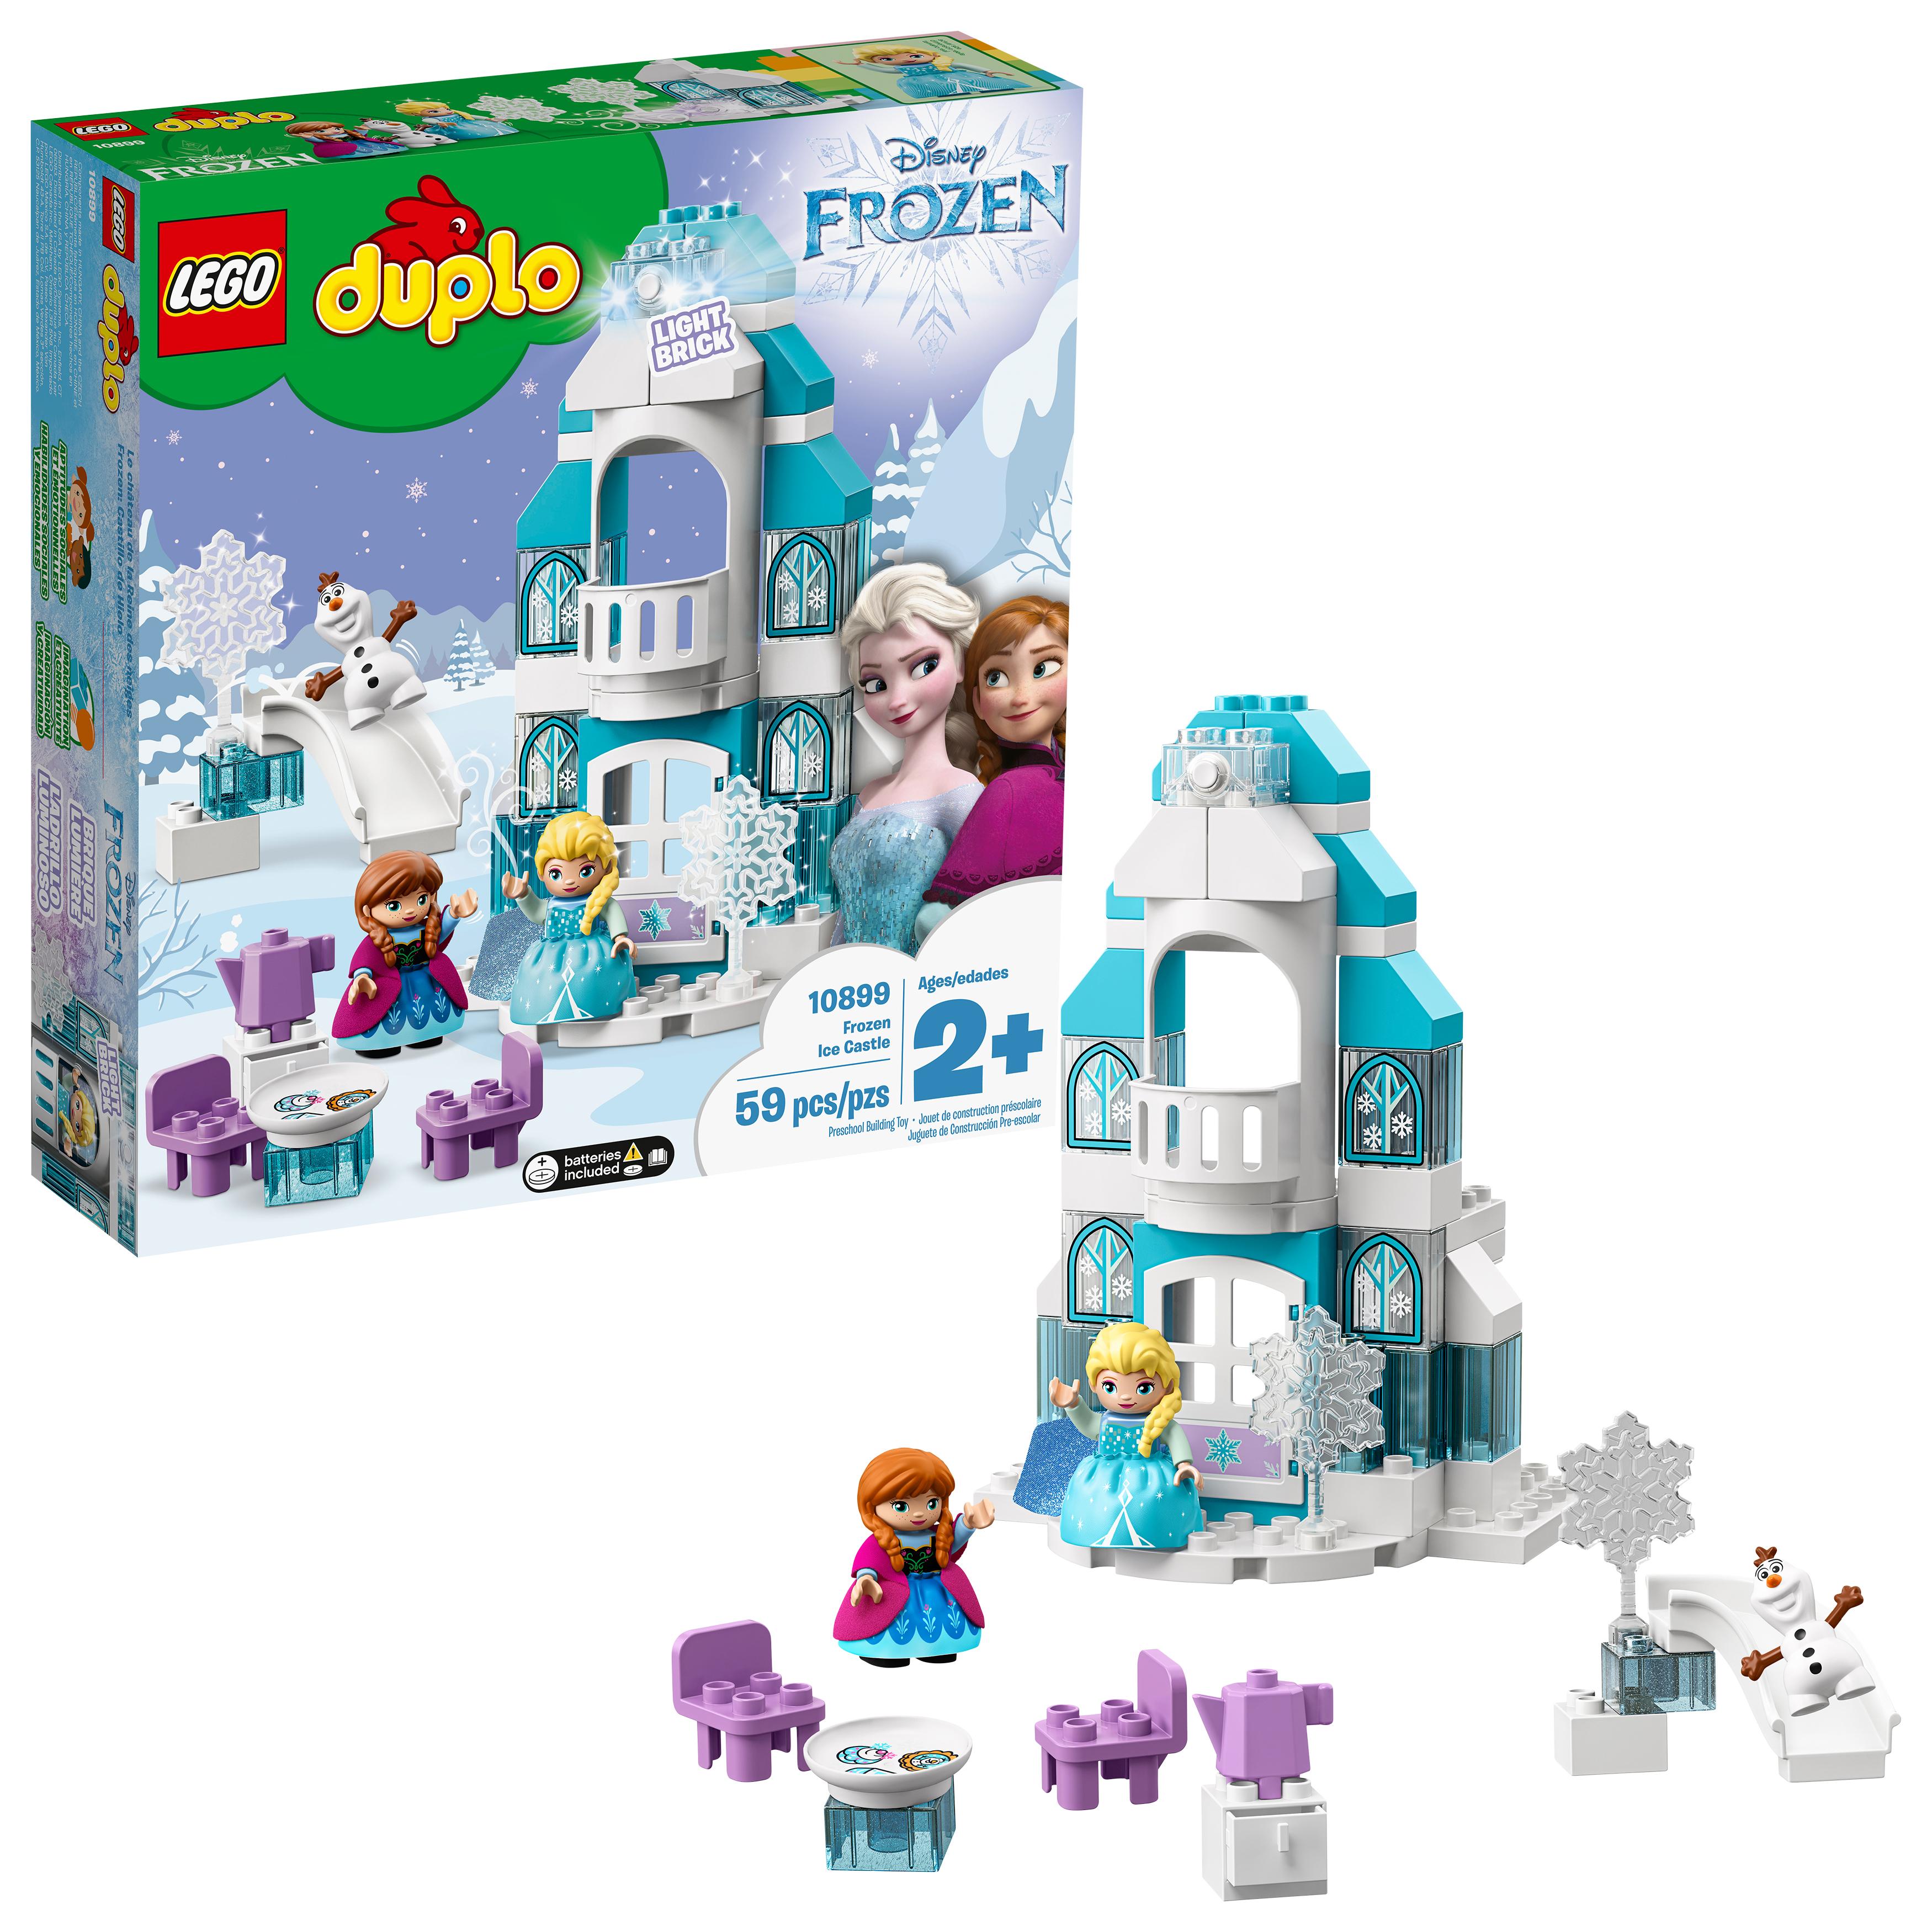 LEGO DUPLO Princess Frozen Ice Castle 10899 Toddler Toy Building Set, $40.99